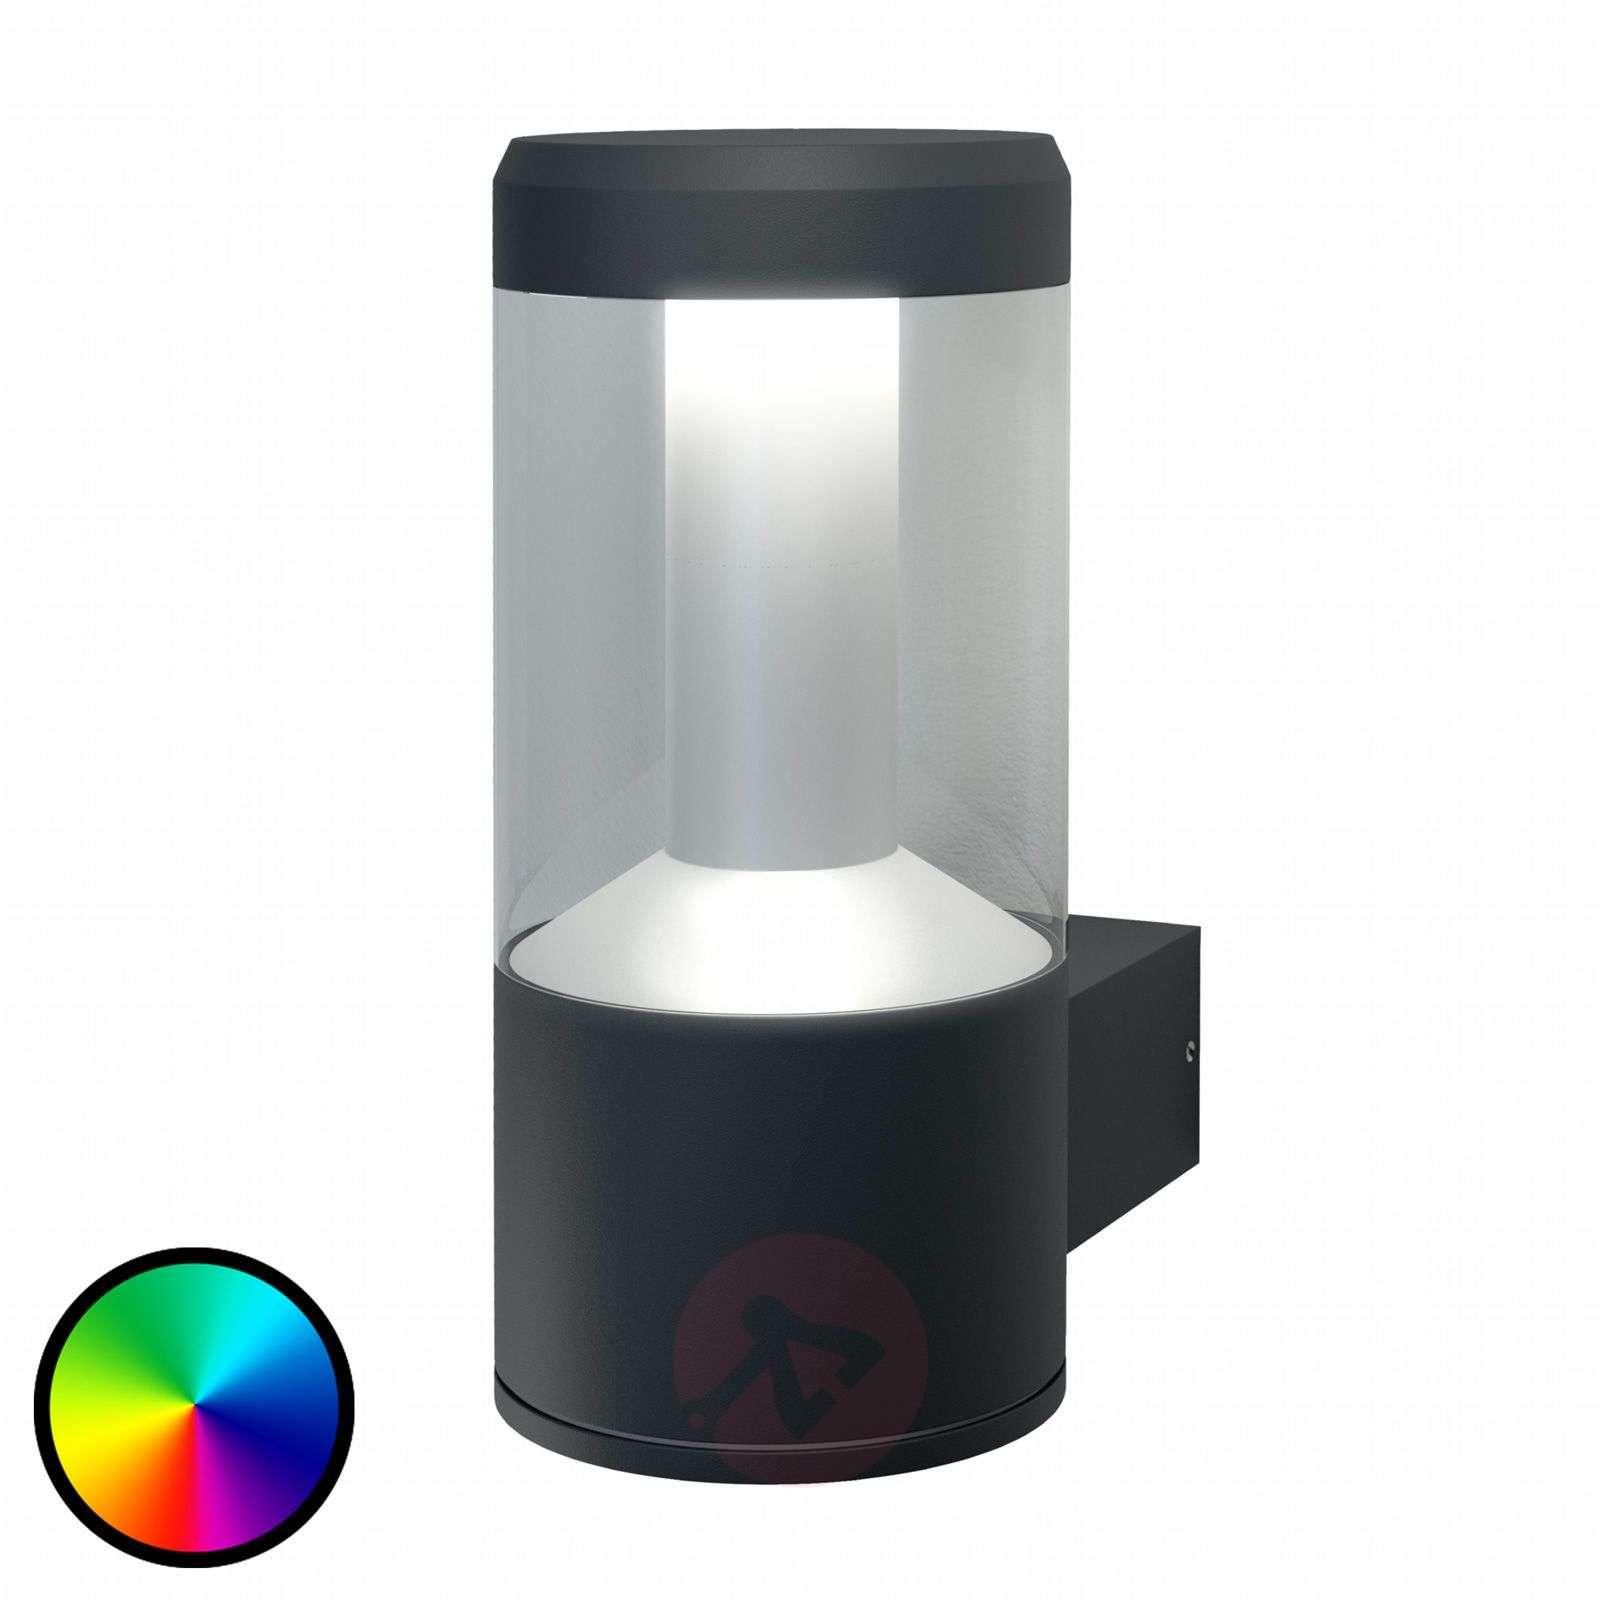 LEDVANCE SMART+ ZigBee Modern Lantern seinälamppu-6106209-03